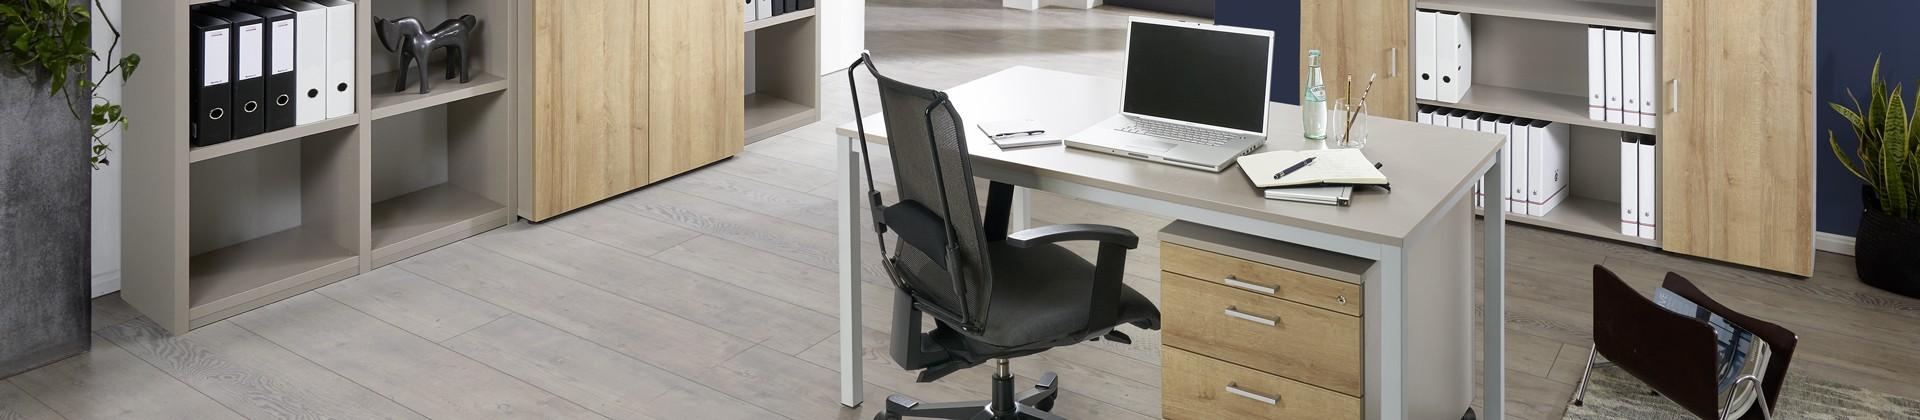 chaises meubles leitenberg. Black Bedroom Furniture Sets. Home Design Ideas